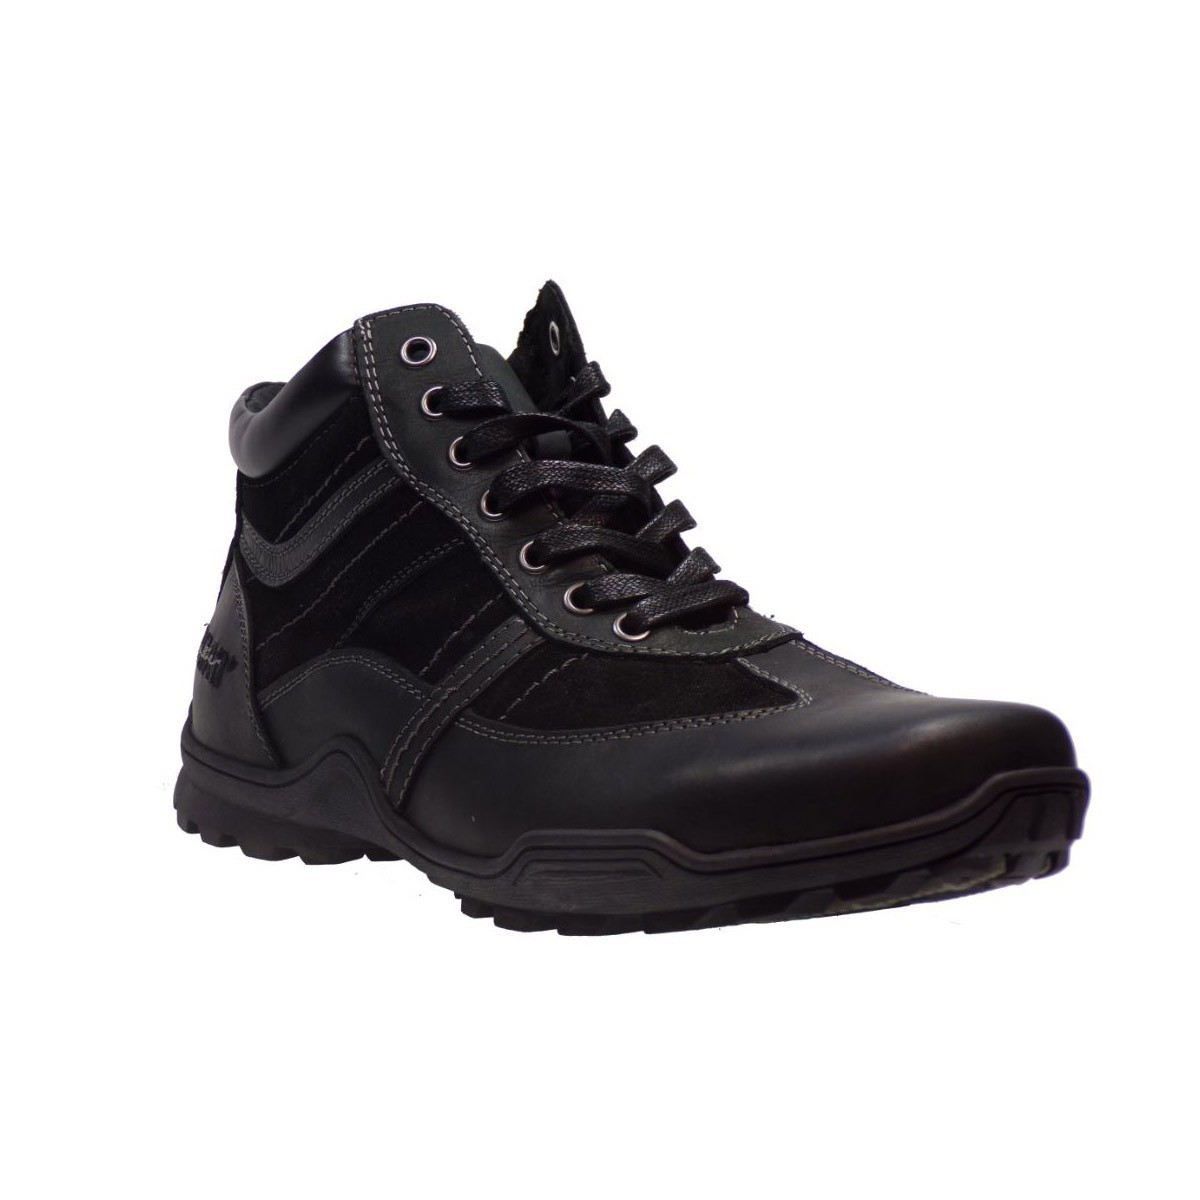 Road Ανδρικά Παπούτσια Μποτάκια 14926 Μαύρο